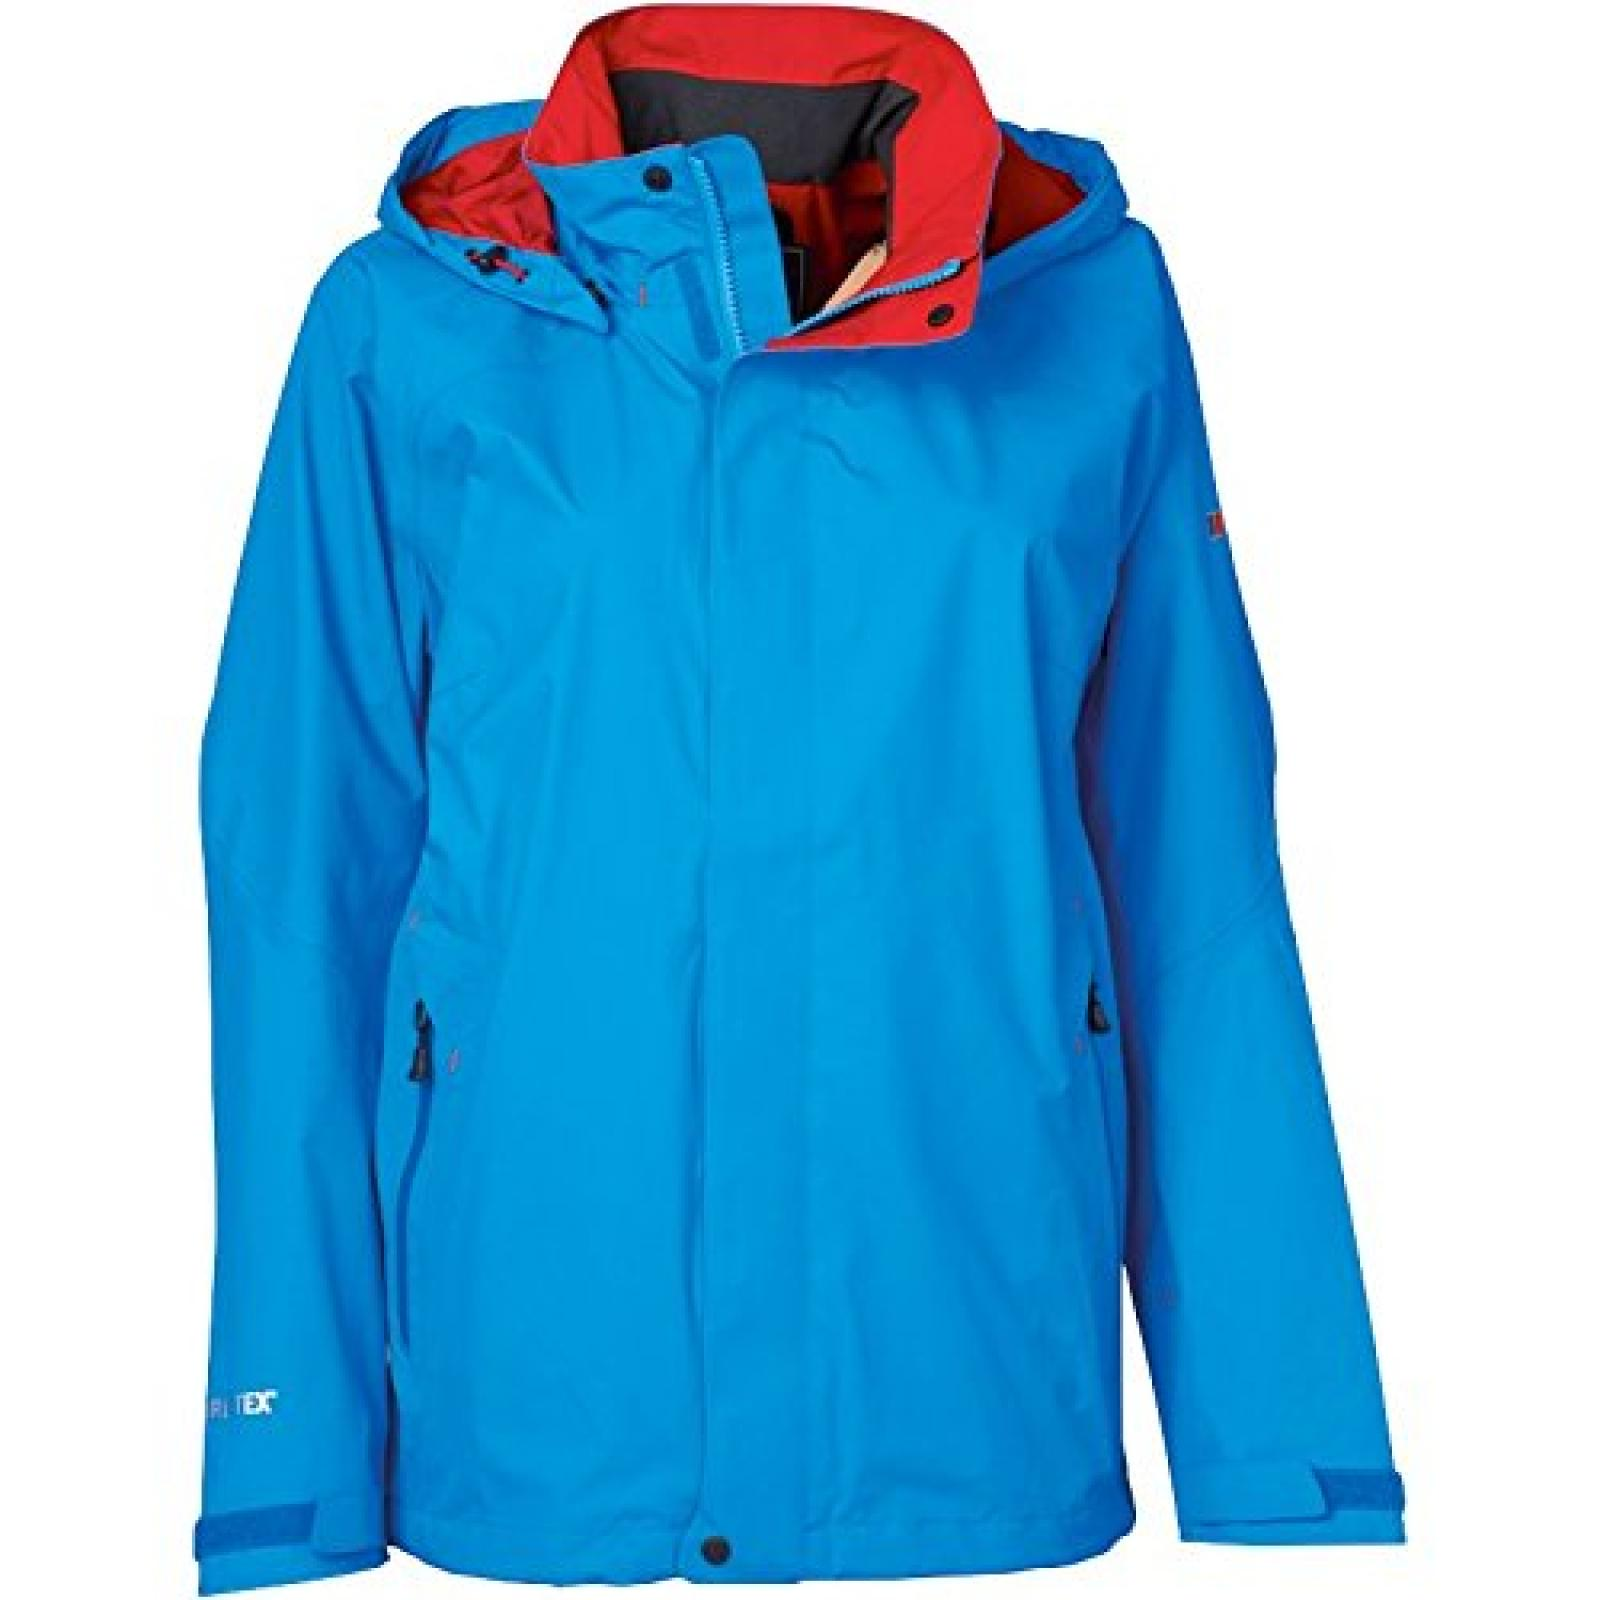 Blau/Rot Berghaus Damen Bowfell Gore-Tex Shell Jacke Blau